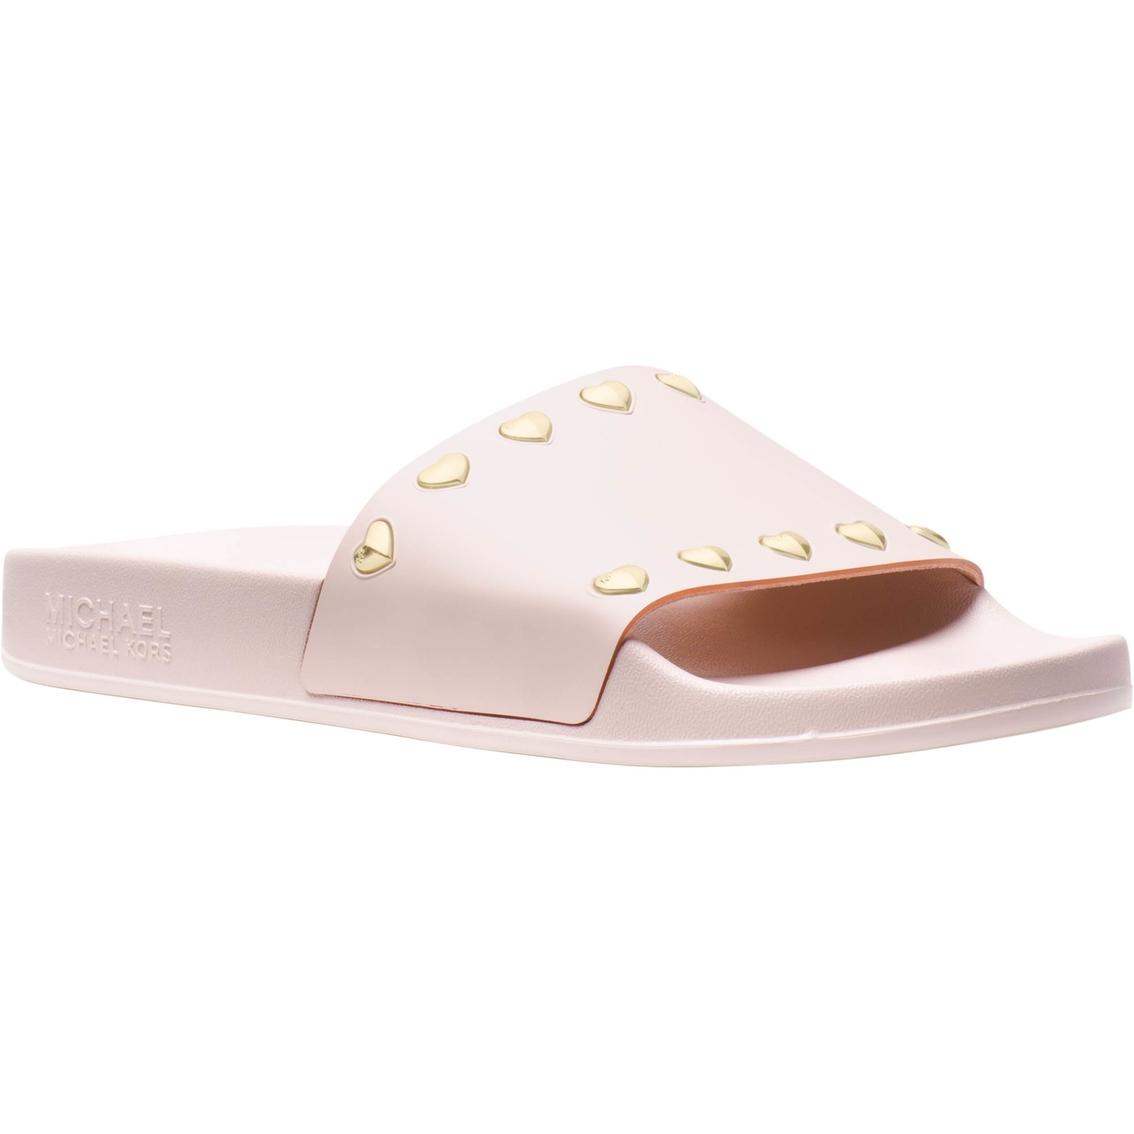 f539fb74a011 Michael Kors Michael Kors Zooey Slide Sandals